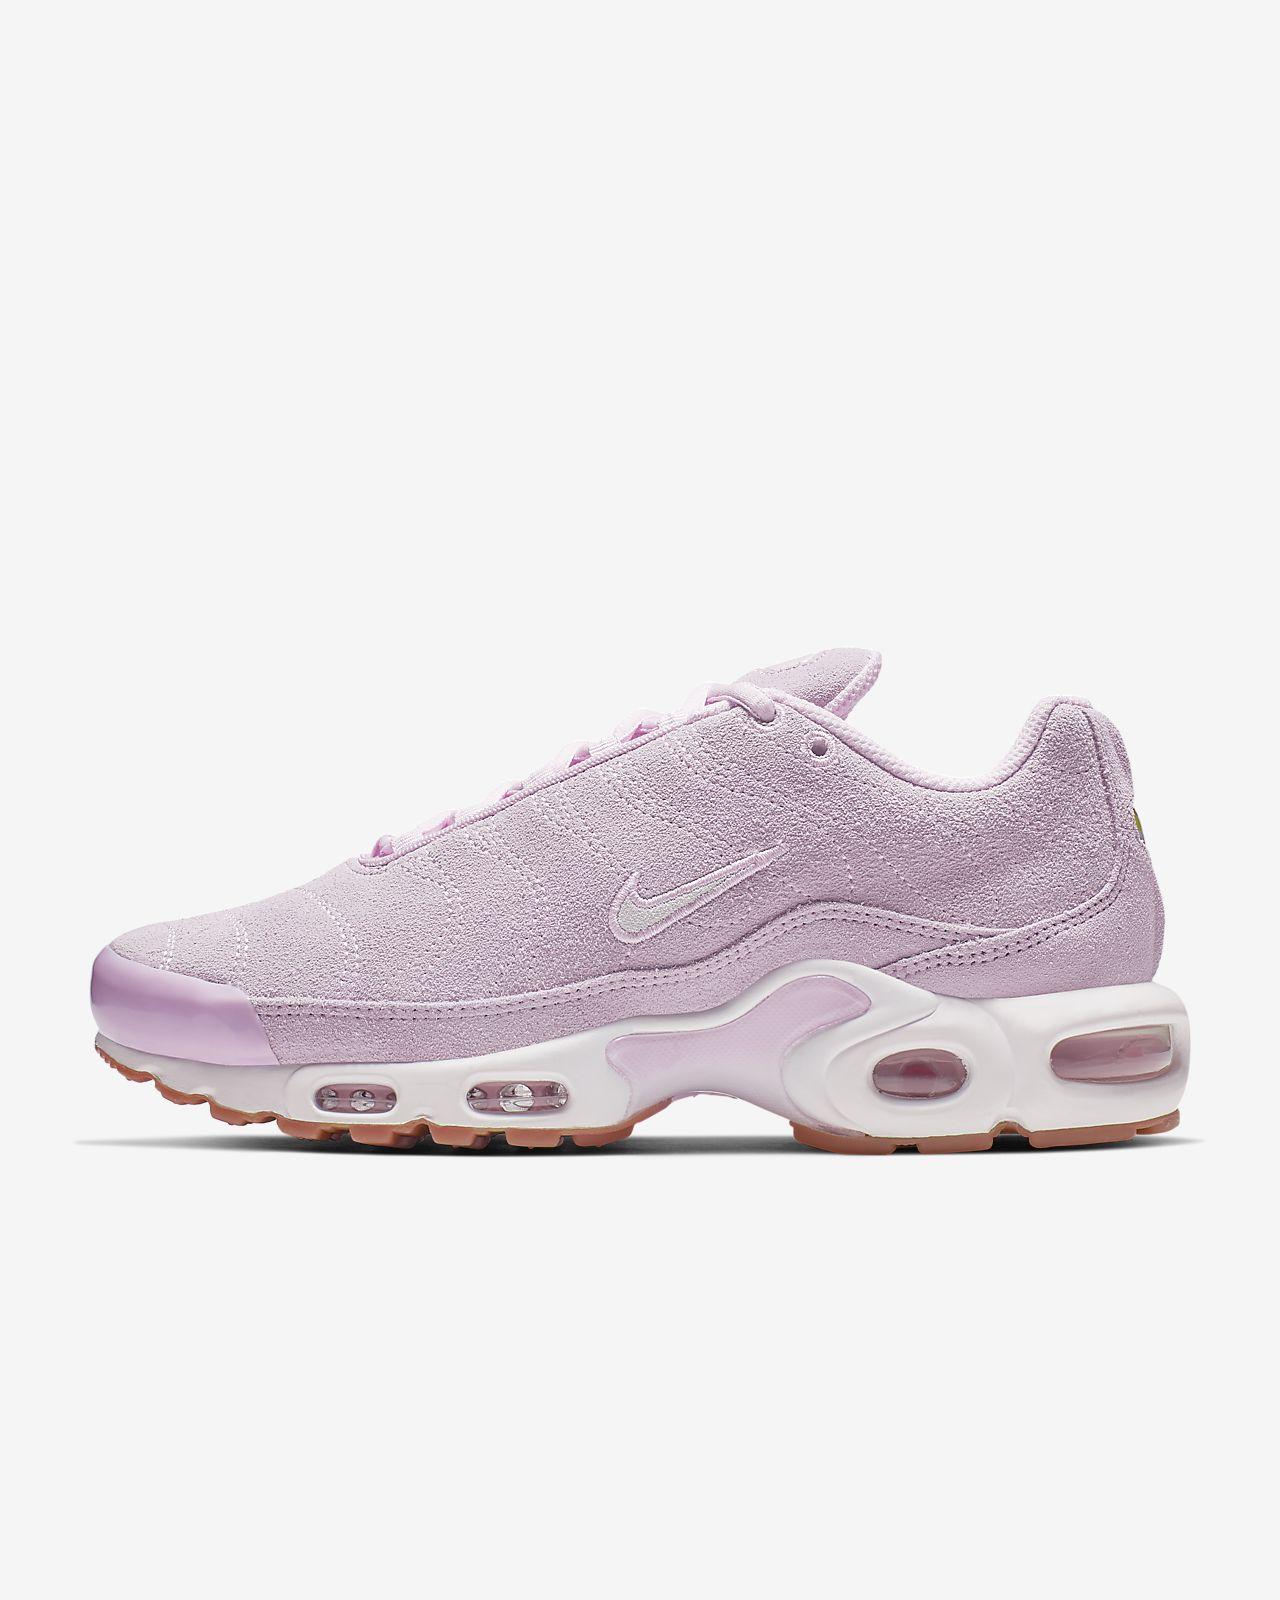 sale retailer f2b63 e78f7 ... Nike Air Max Plus Premium sko til dame